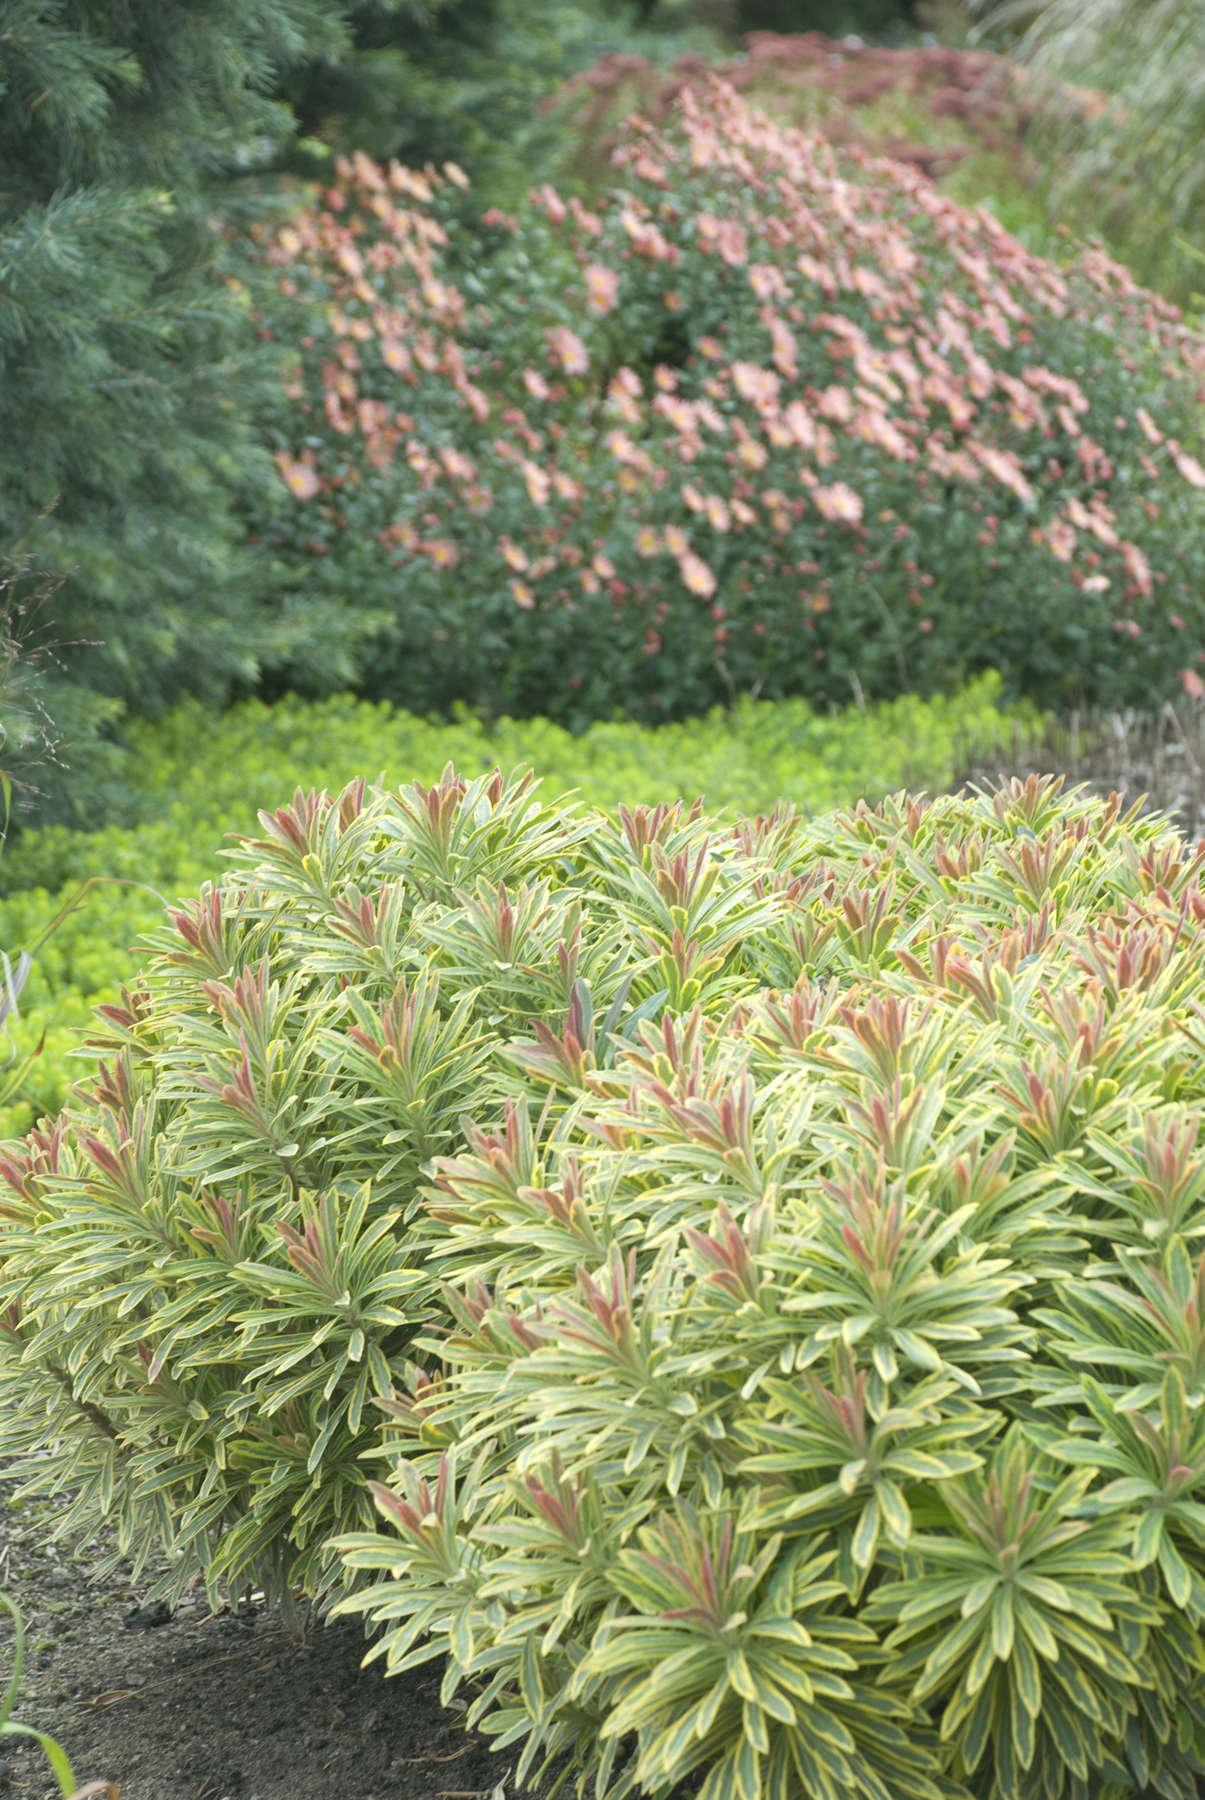 Euphorbia Polychroma vs. Euphorbia 'Ascot Rainbow'